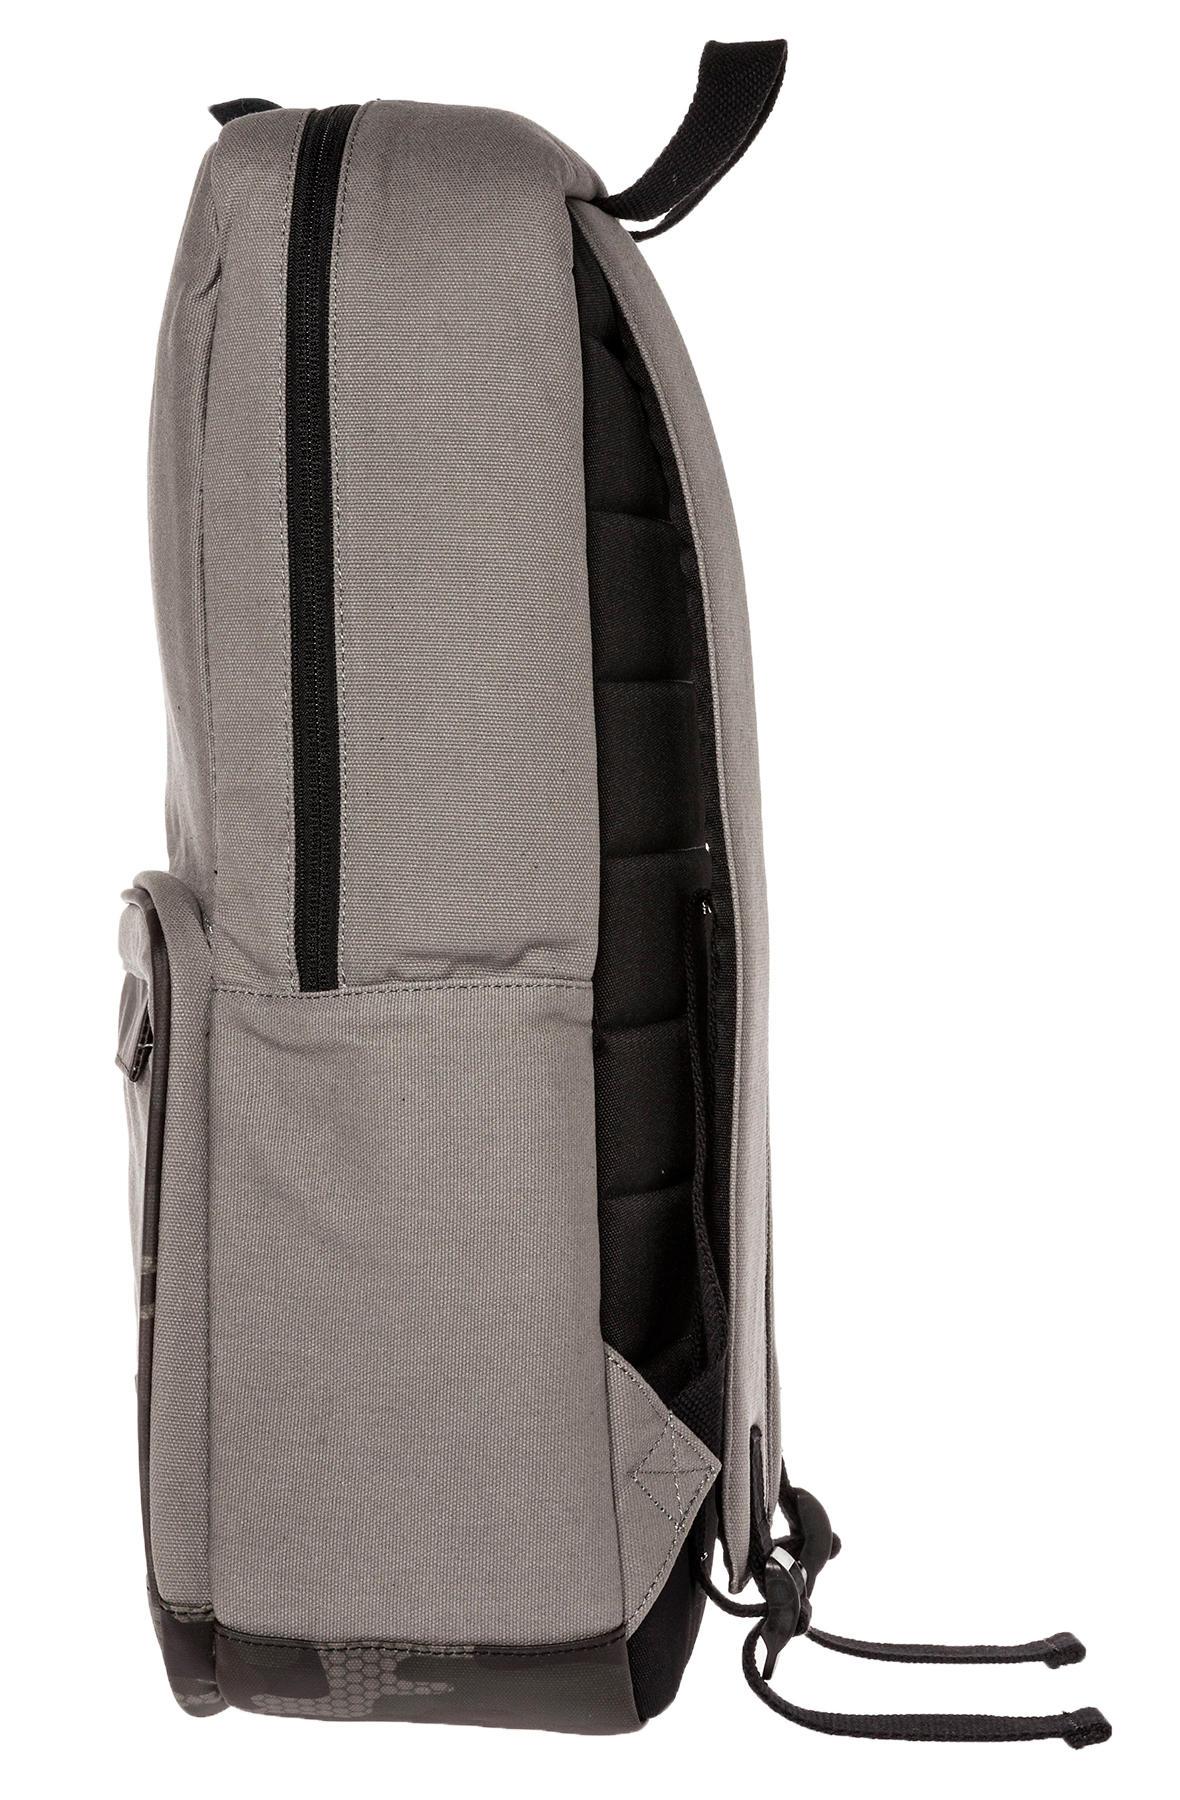 3628a2986f Adidas Forman Mesh Backpack Blue Orange - Fairway Golf and Print